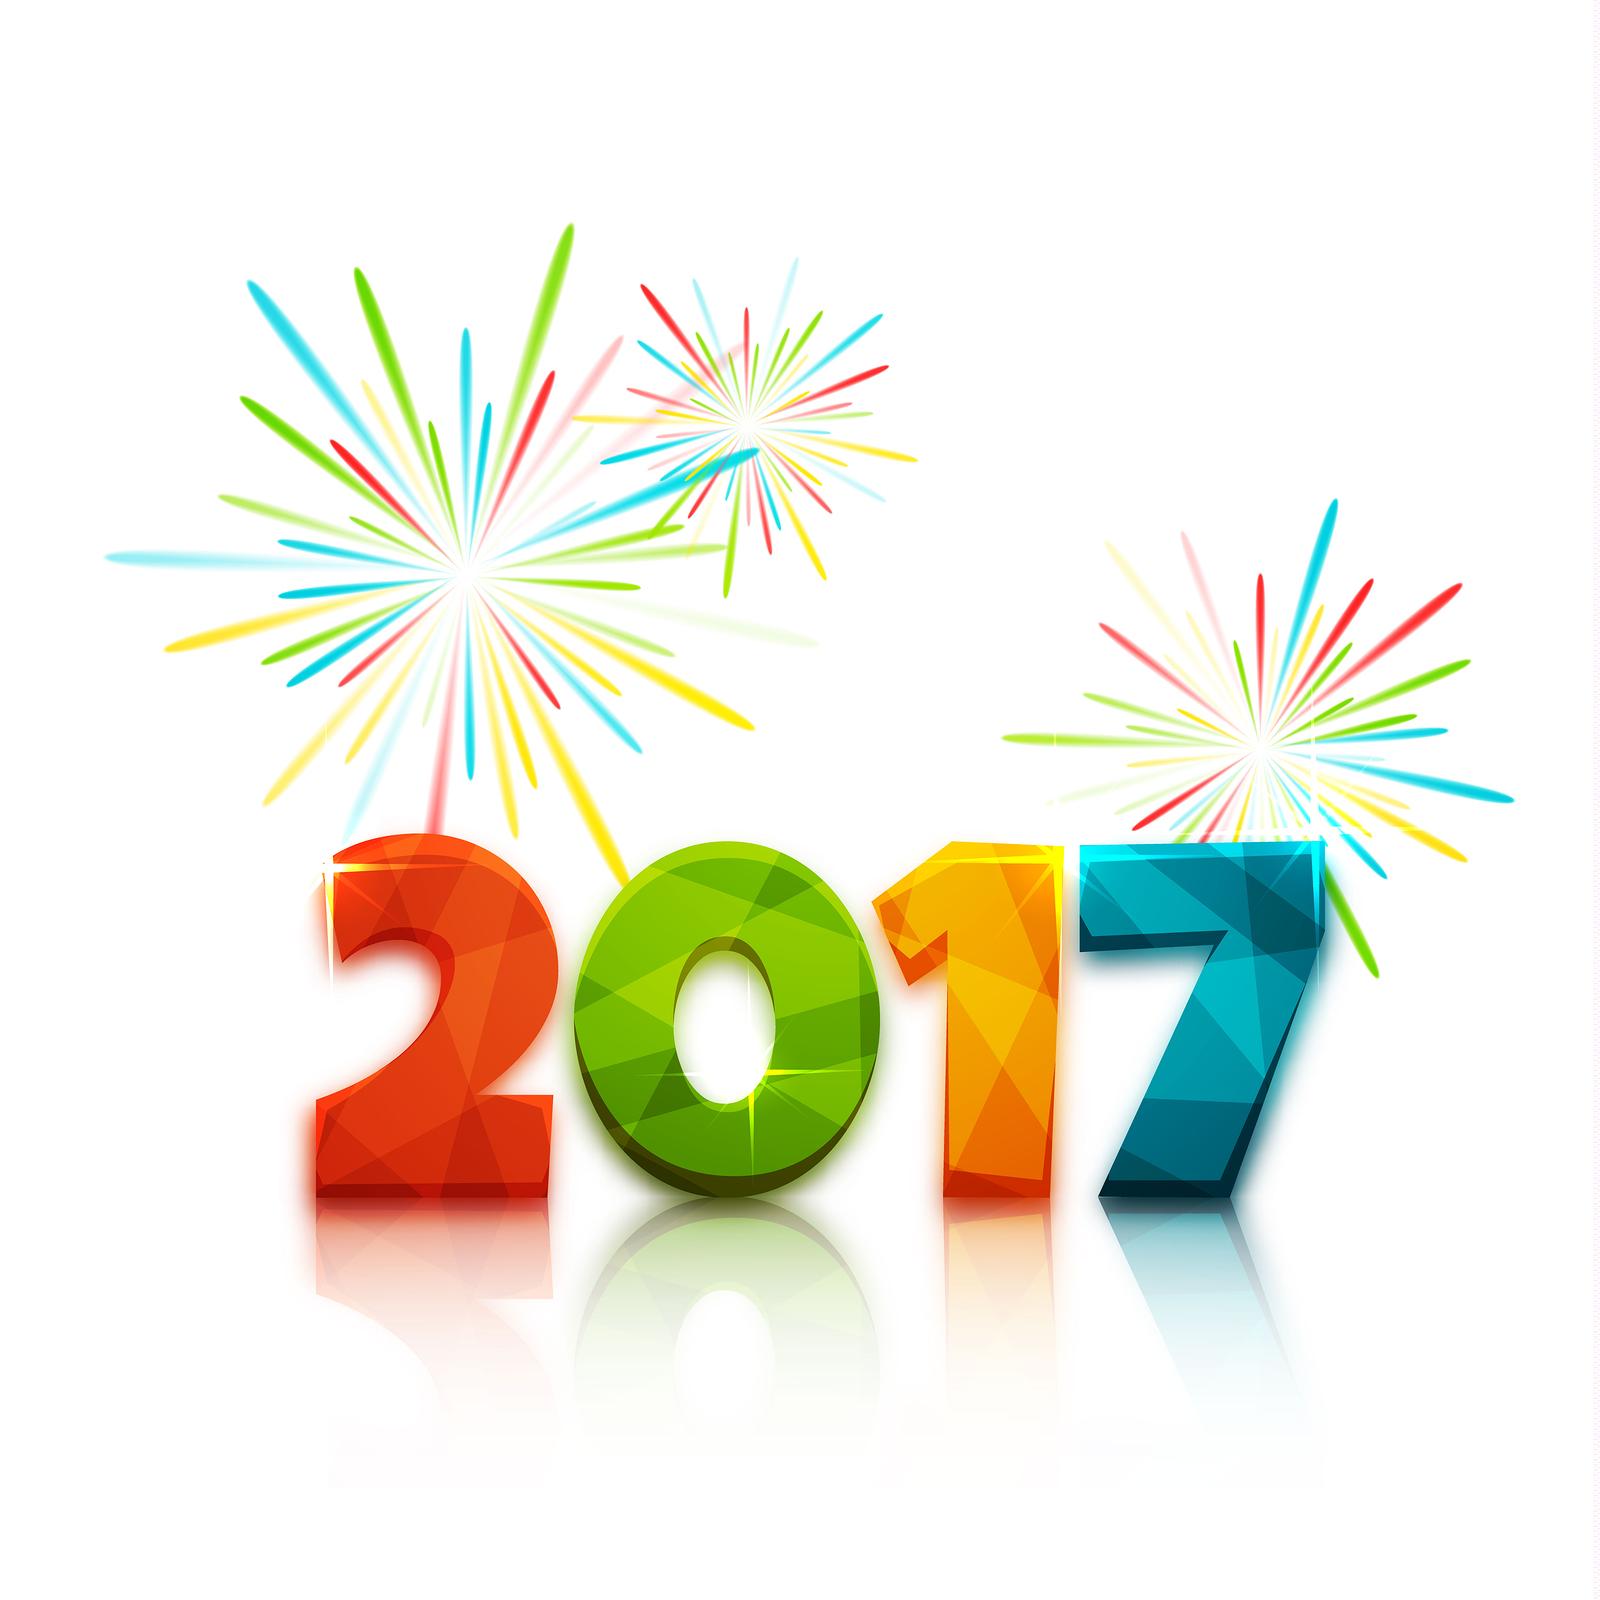 5 steg mot ditt bästa 2017